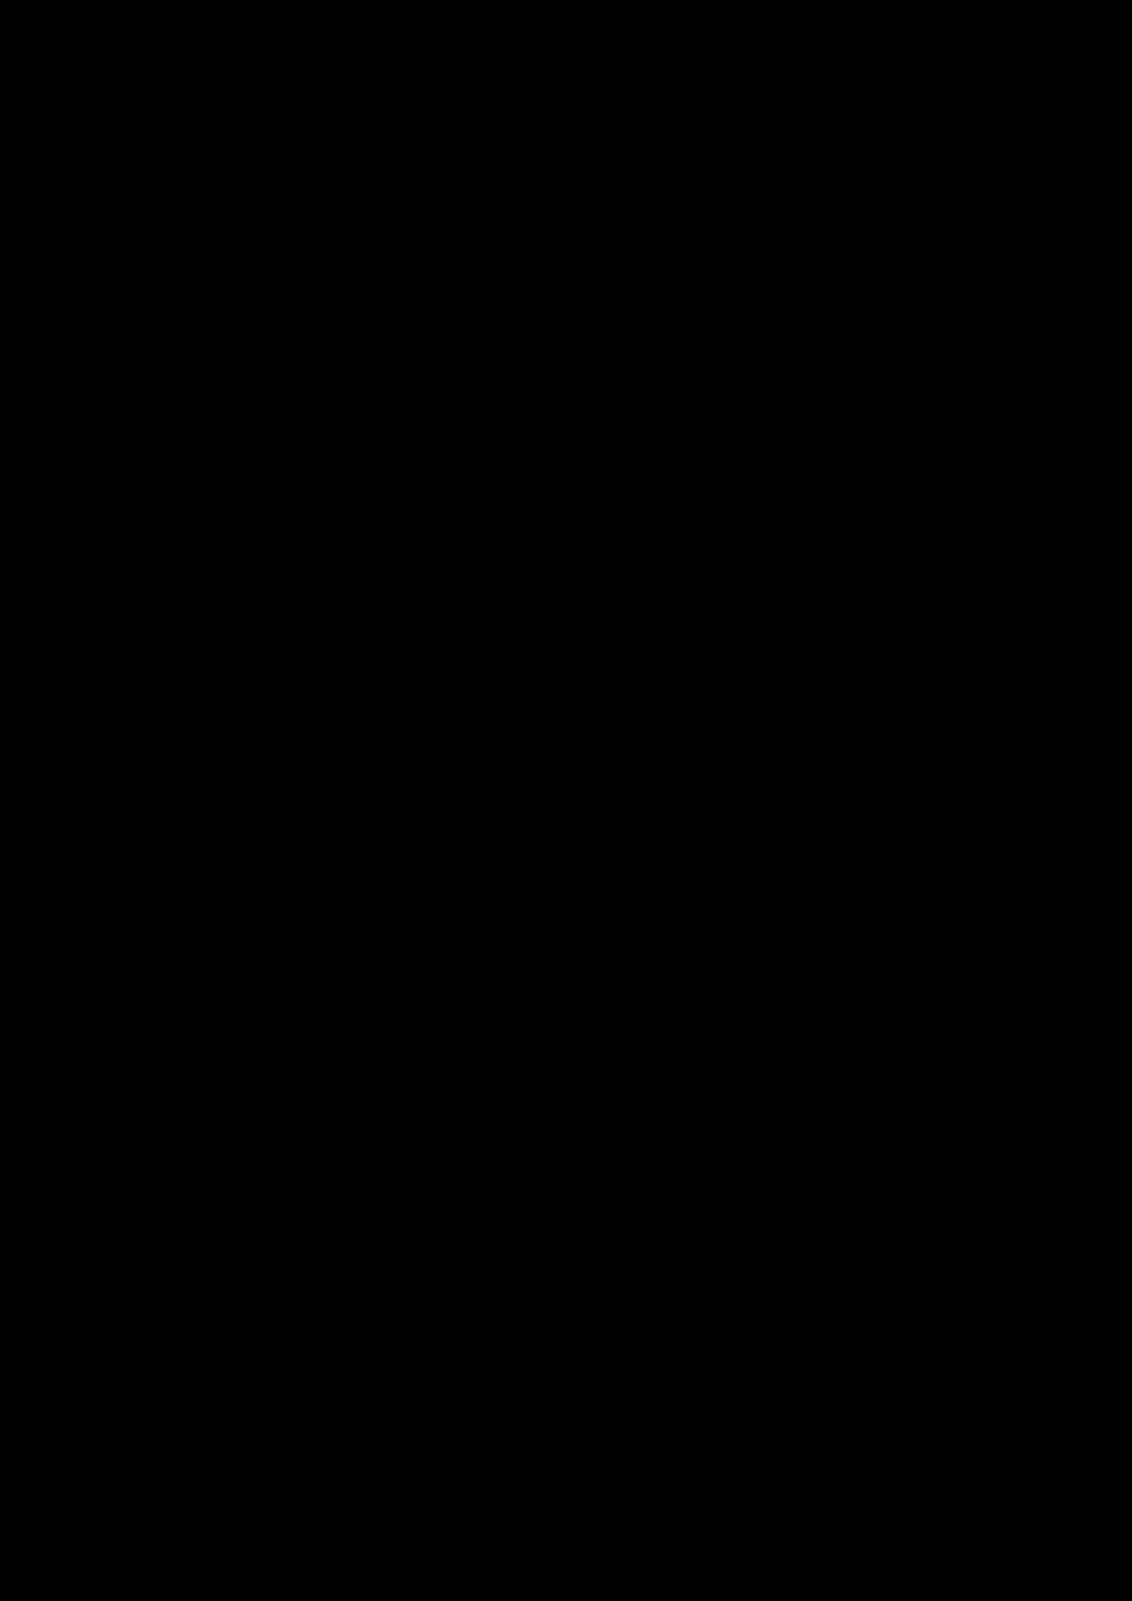 Mrs. Vandebilt slide, Image 2